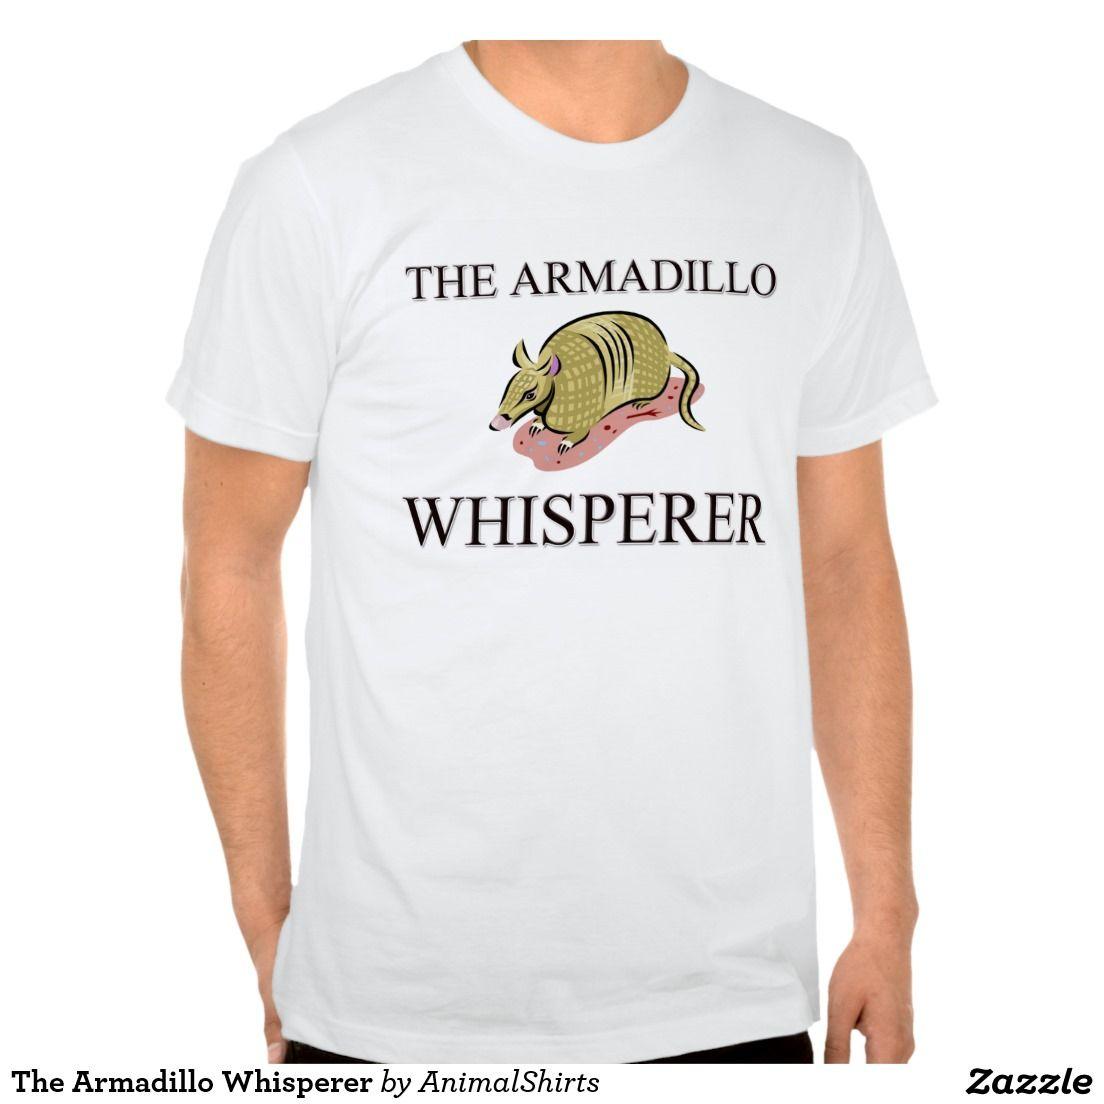 The Armadillo Whisperer Shirts